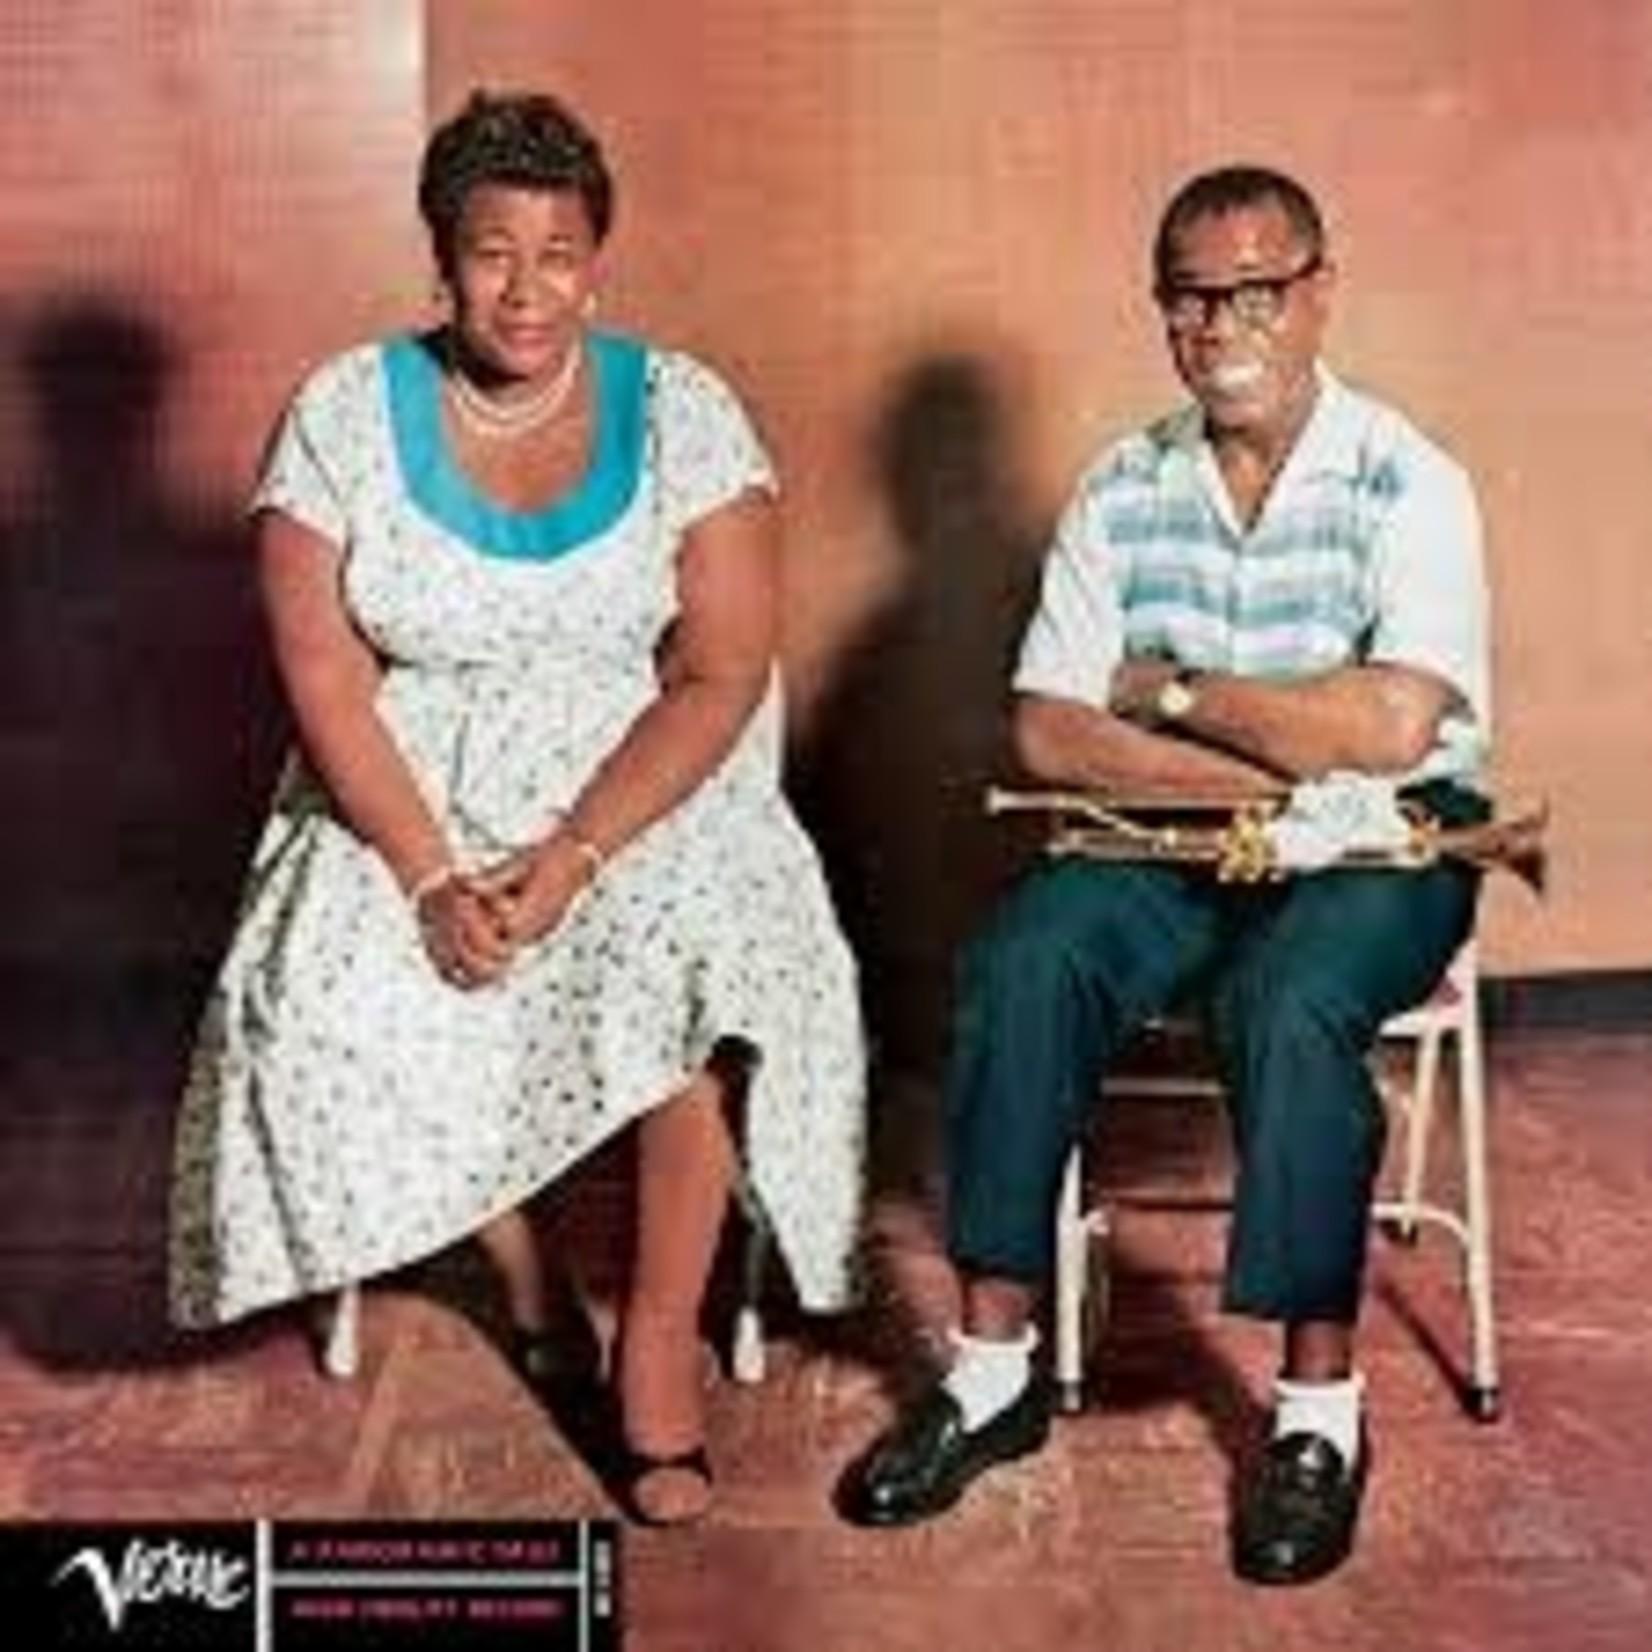 Vinyl Ella & Louis - ST